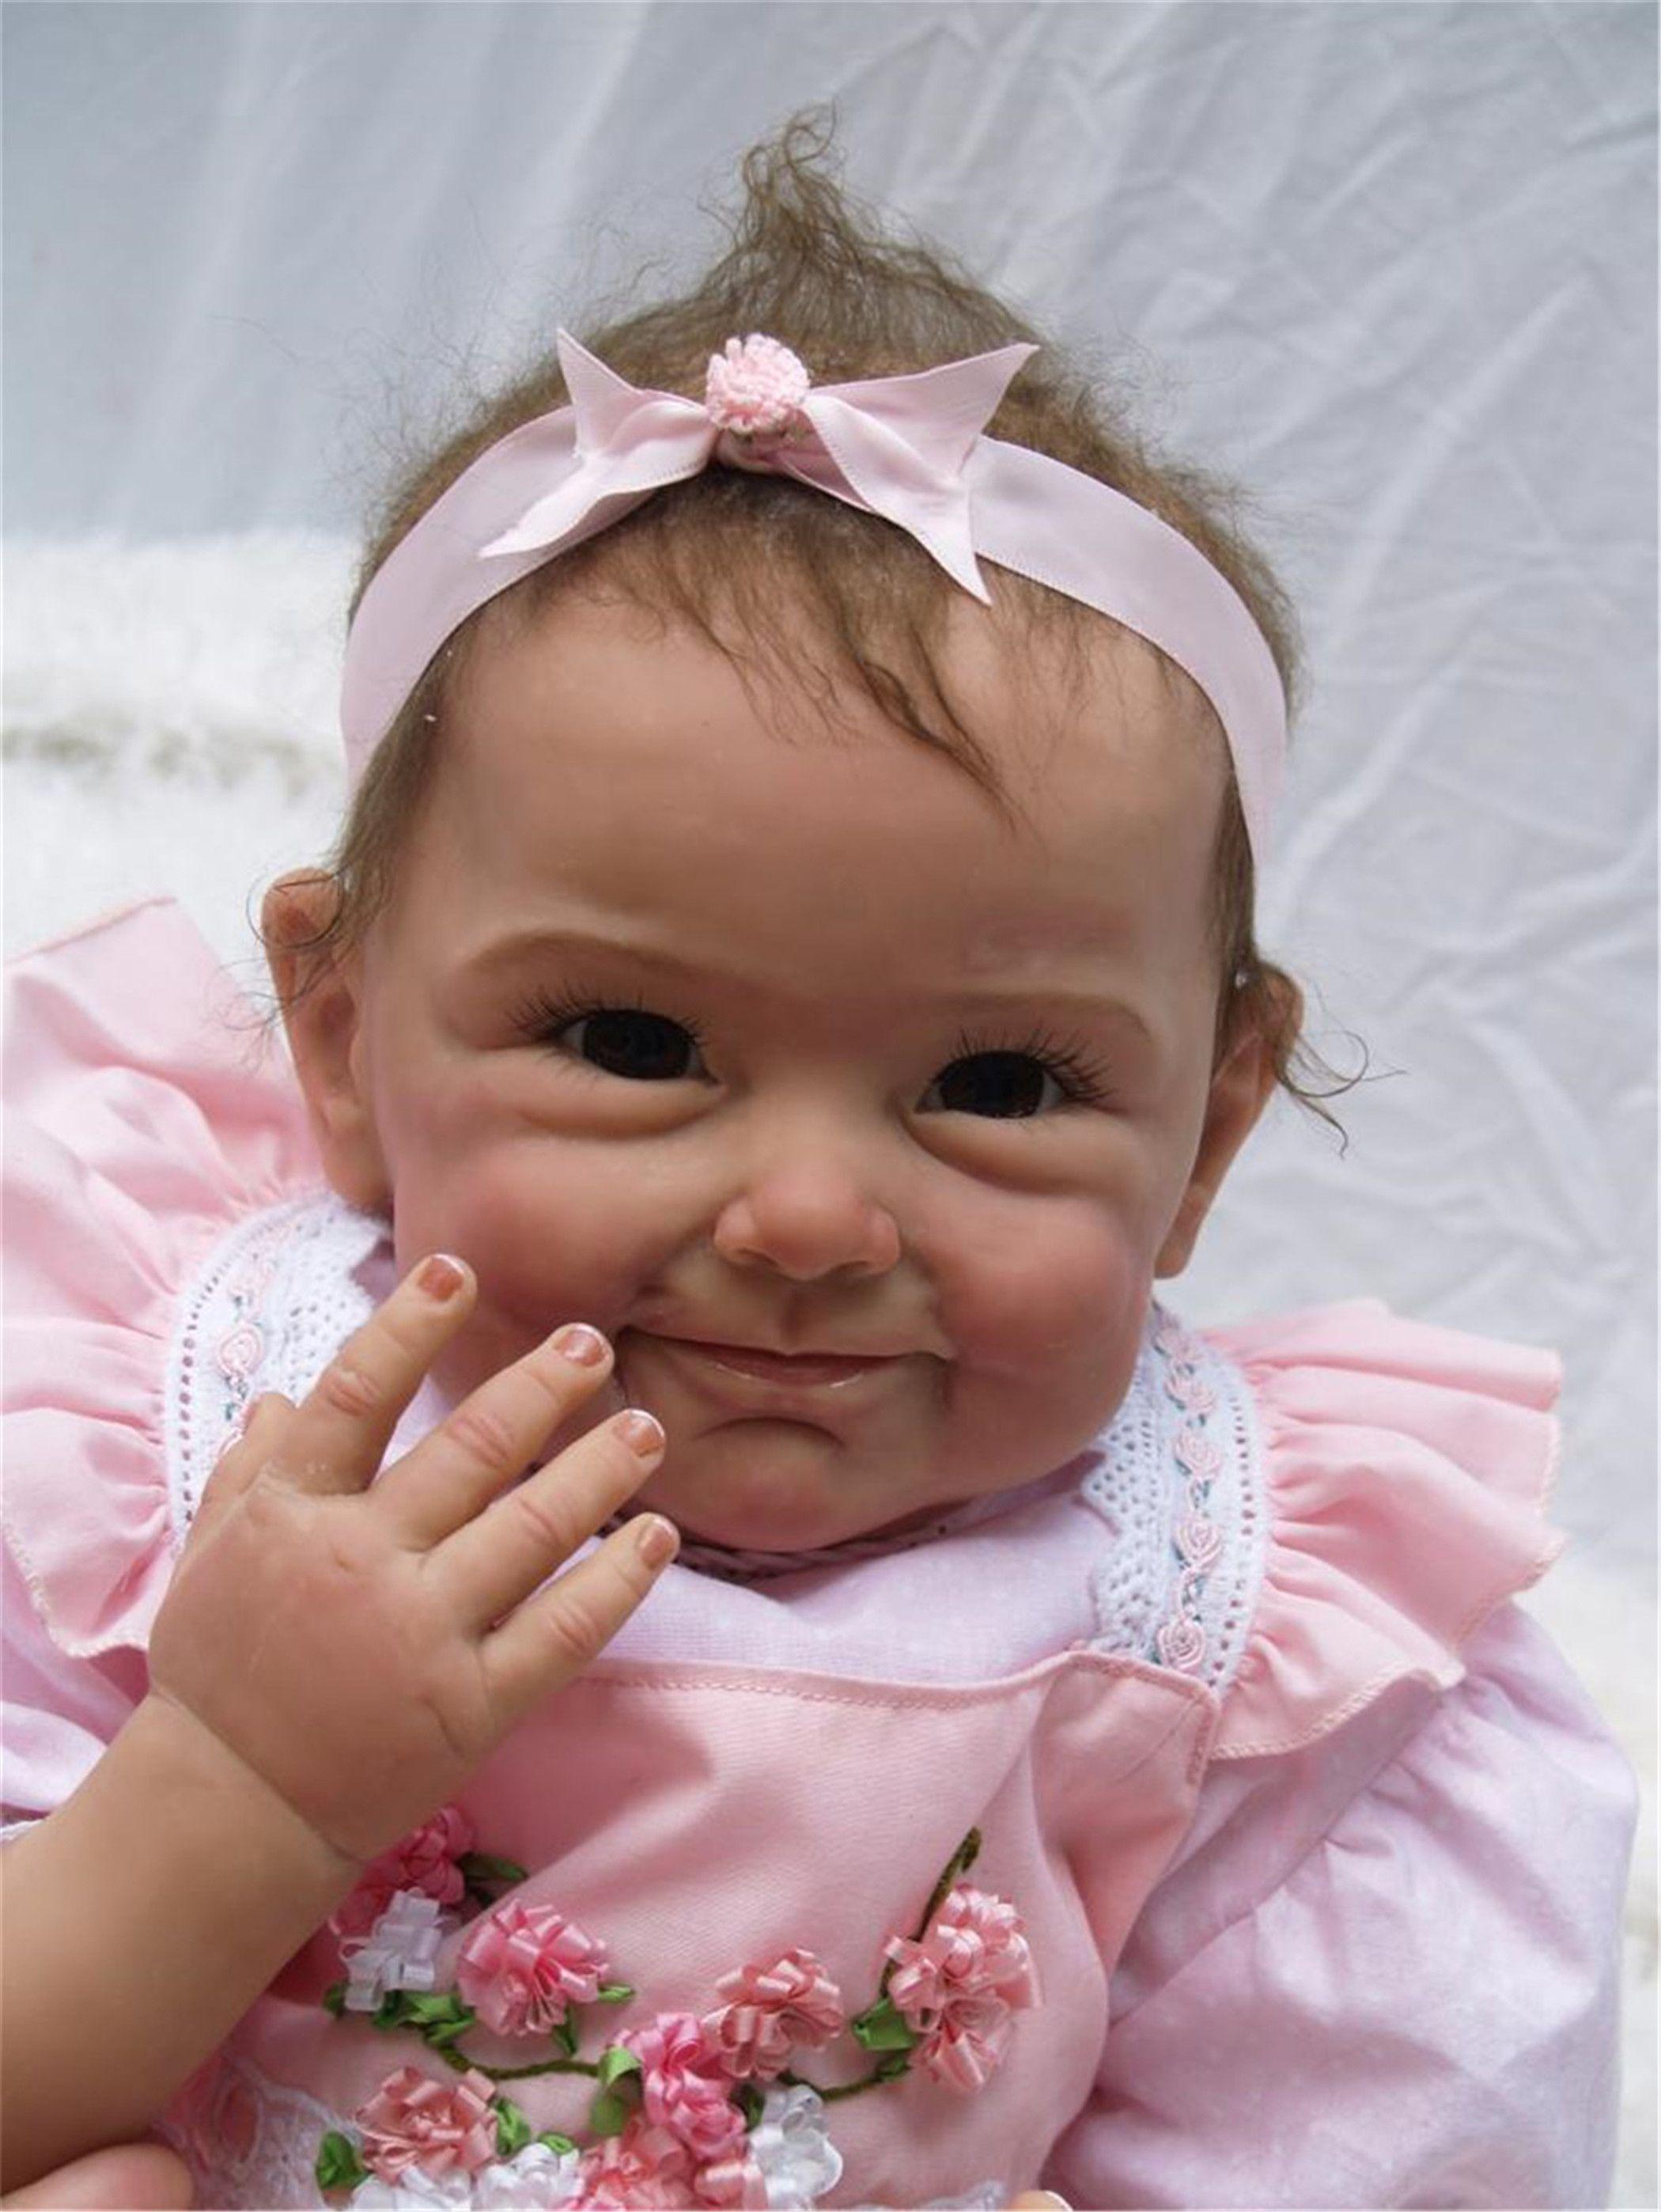 22 Handmade Lifelike Reborn Baby Doll Newborn Silicone